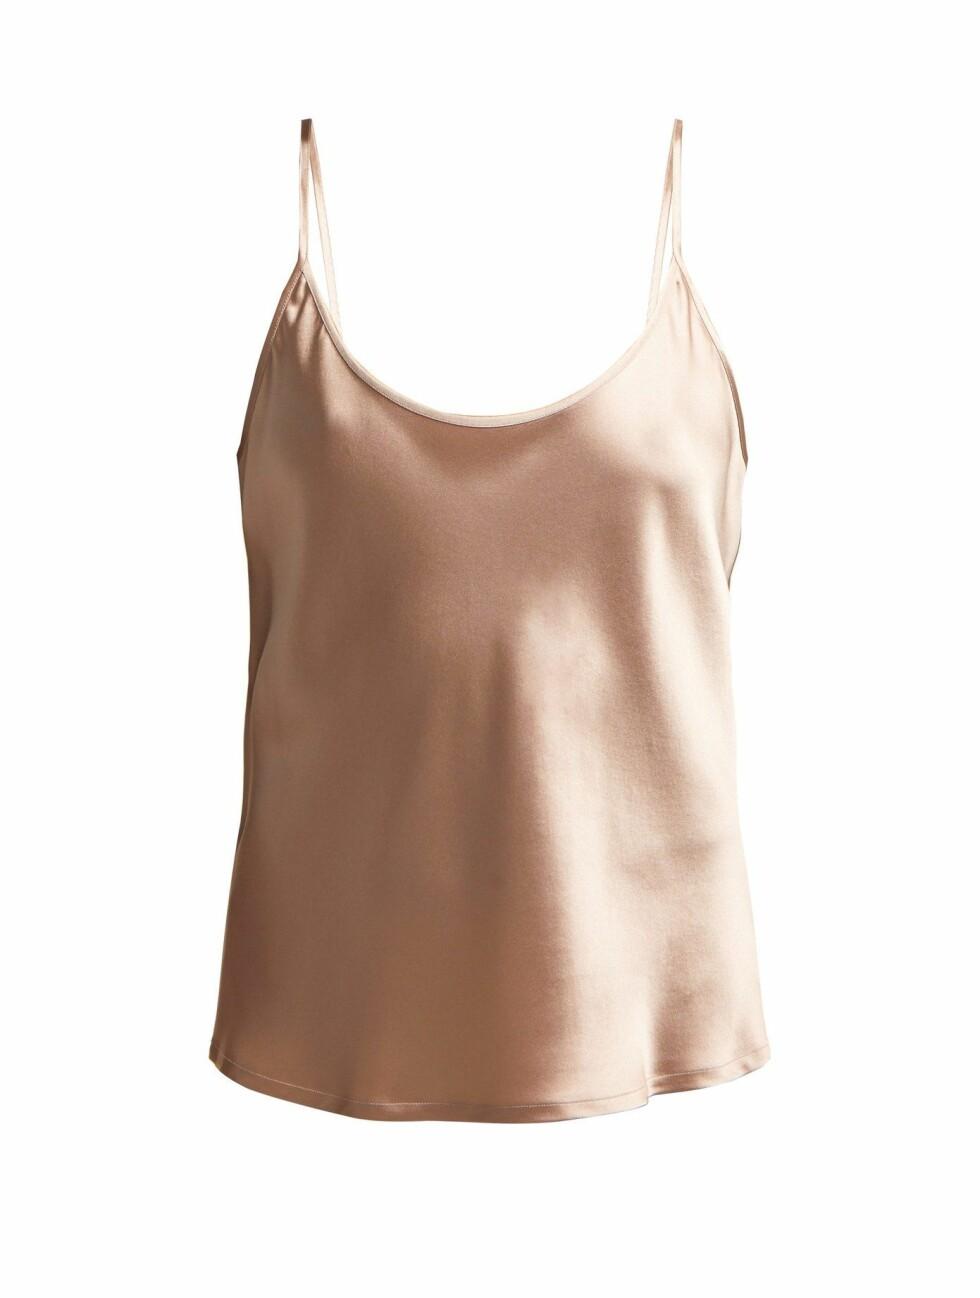 Overdel fra La Perla |880,-| https://www.matchesfashion.com/intl/products/La-Perla-Scoop-neck-silk-satin-cami-top-1248406